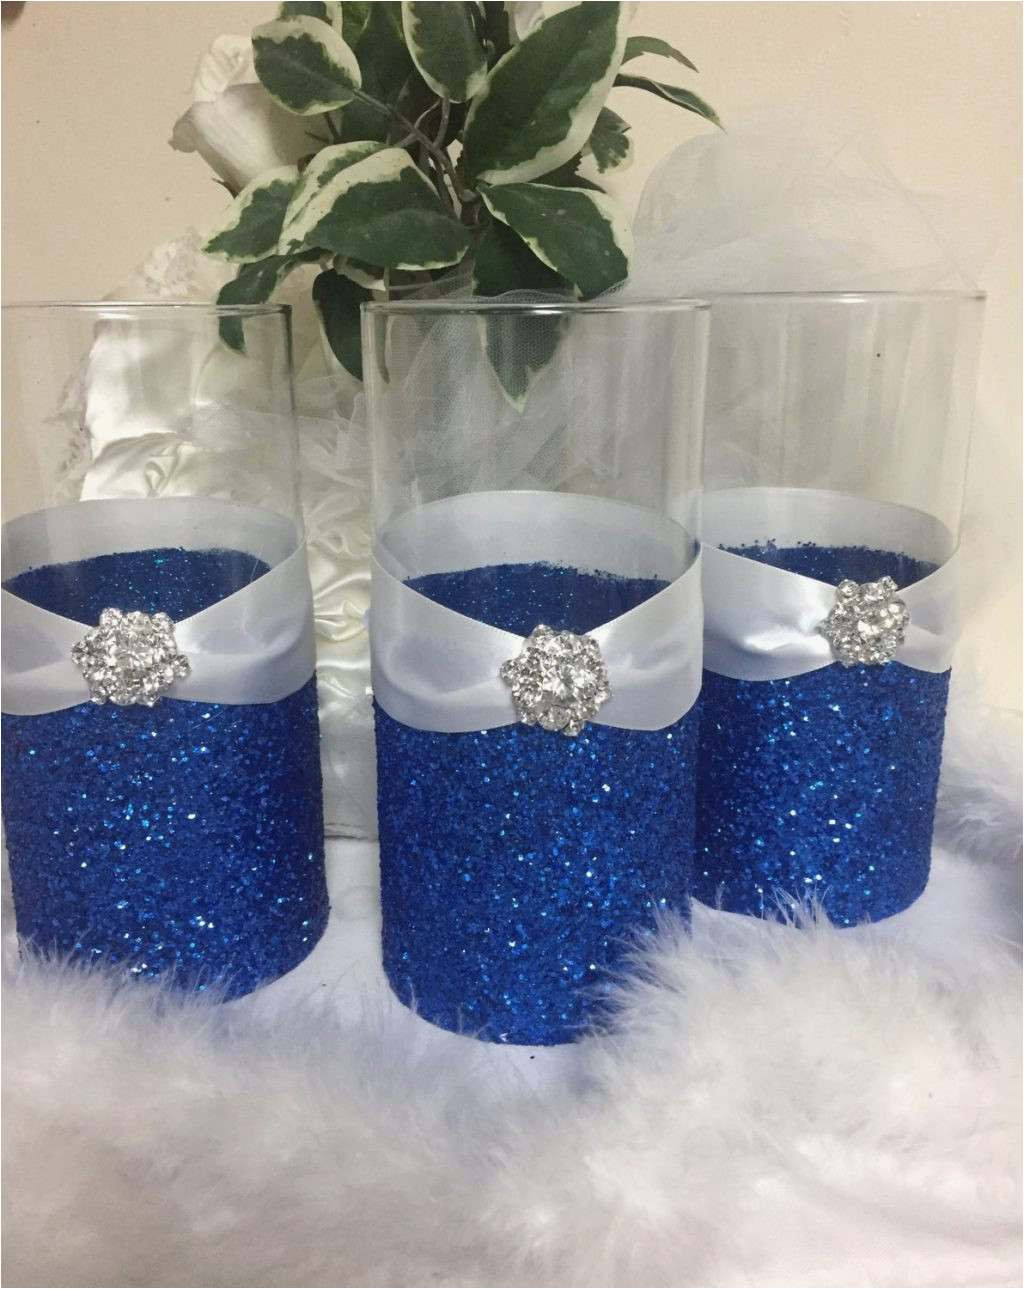 crystal vases for wedding centerpieces of diy wedding ideas tallh vases glitter vase centerpiece diy vasei 0d throughout diy wedding plan tallh vases glitter vase centerpiece diy vasei 0d ba